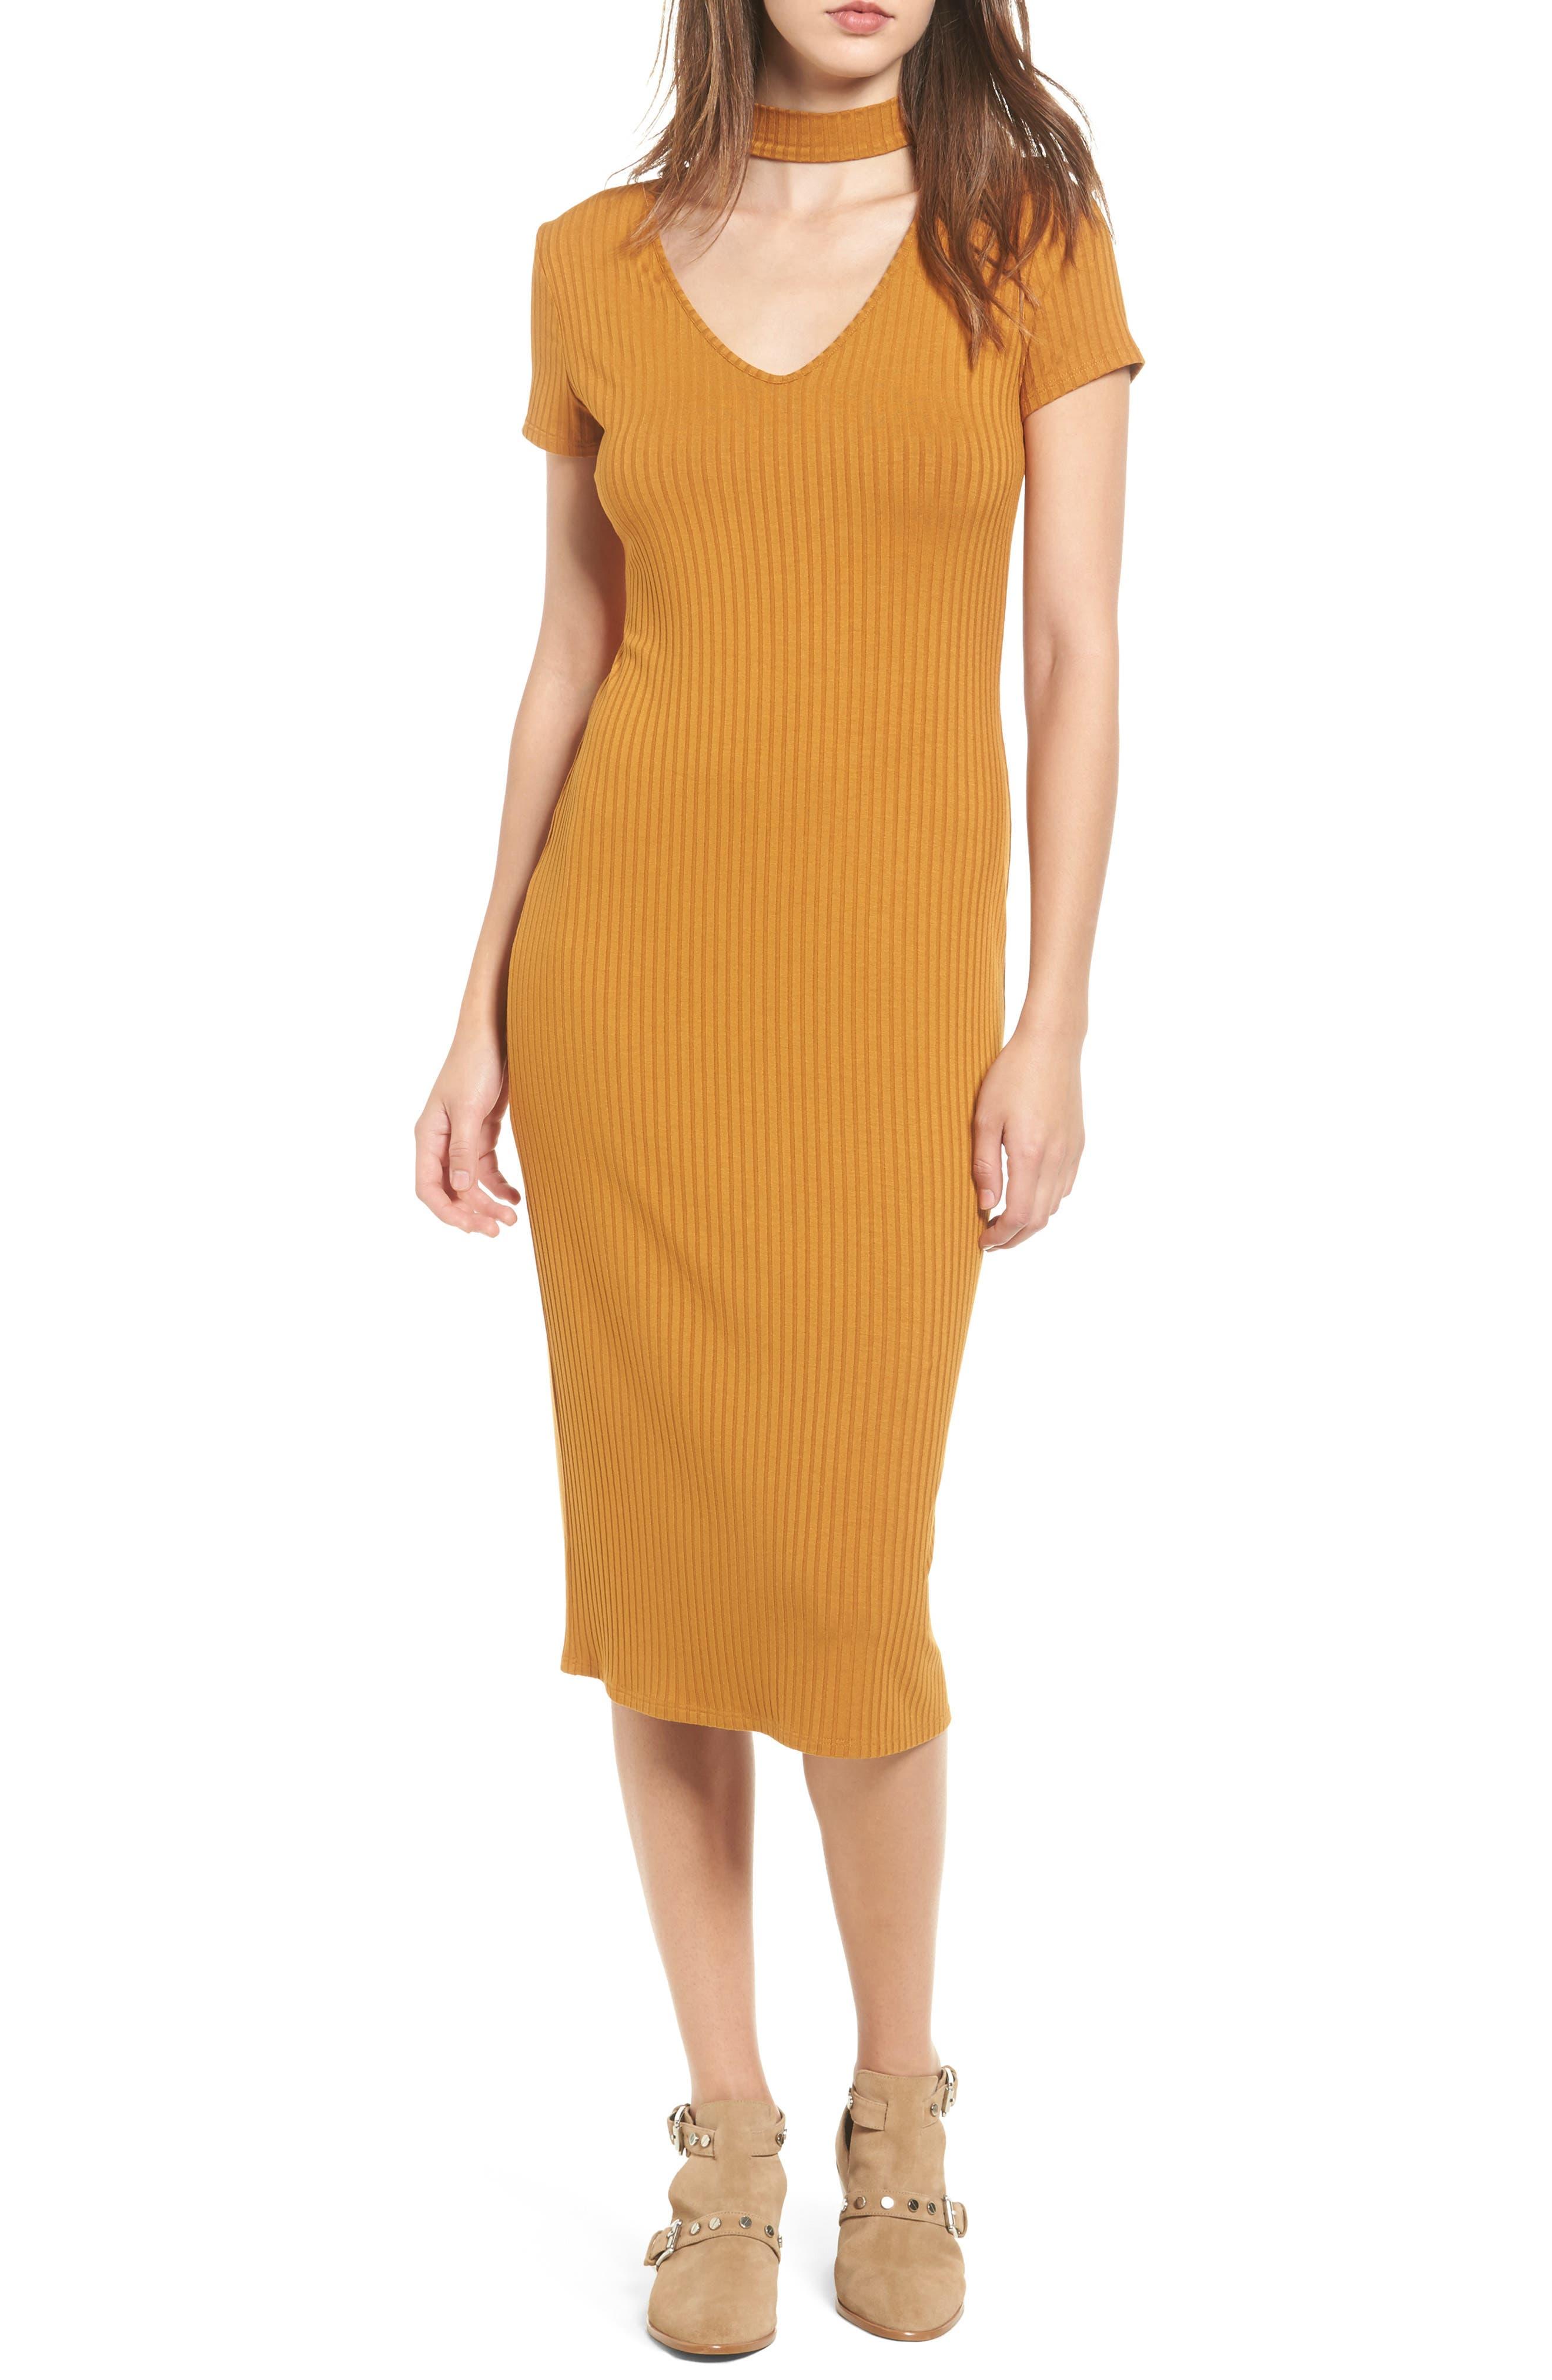 One Clothing Ribbed Choker Midi Dress